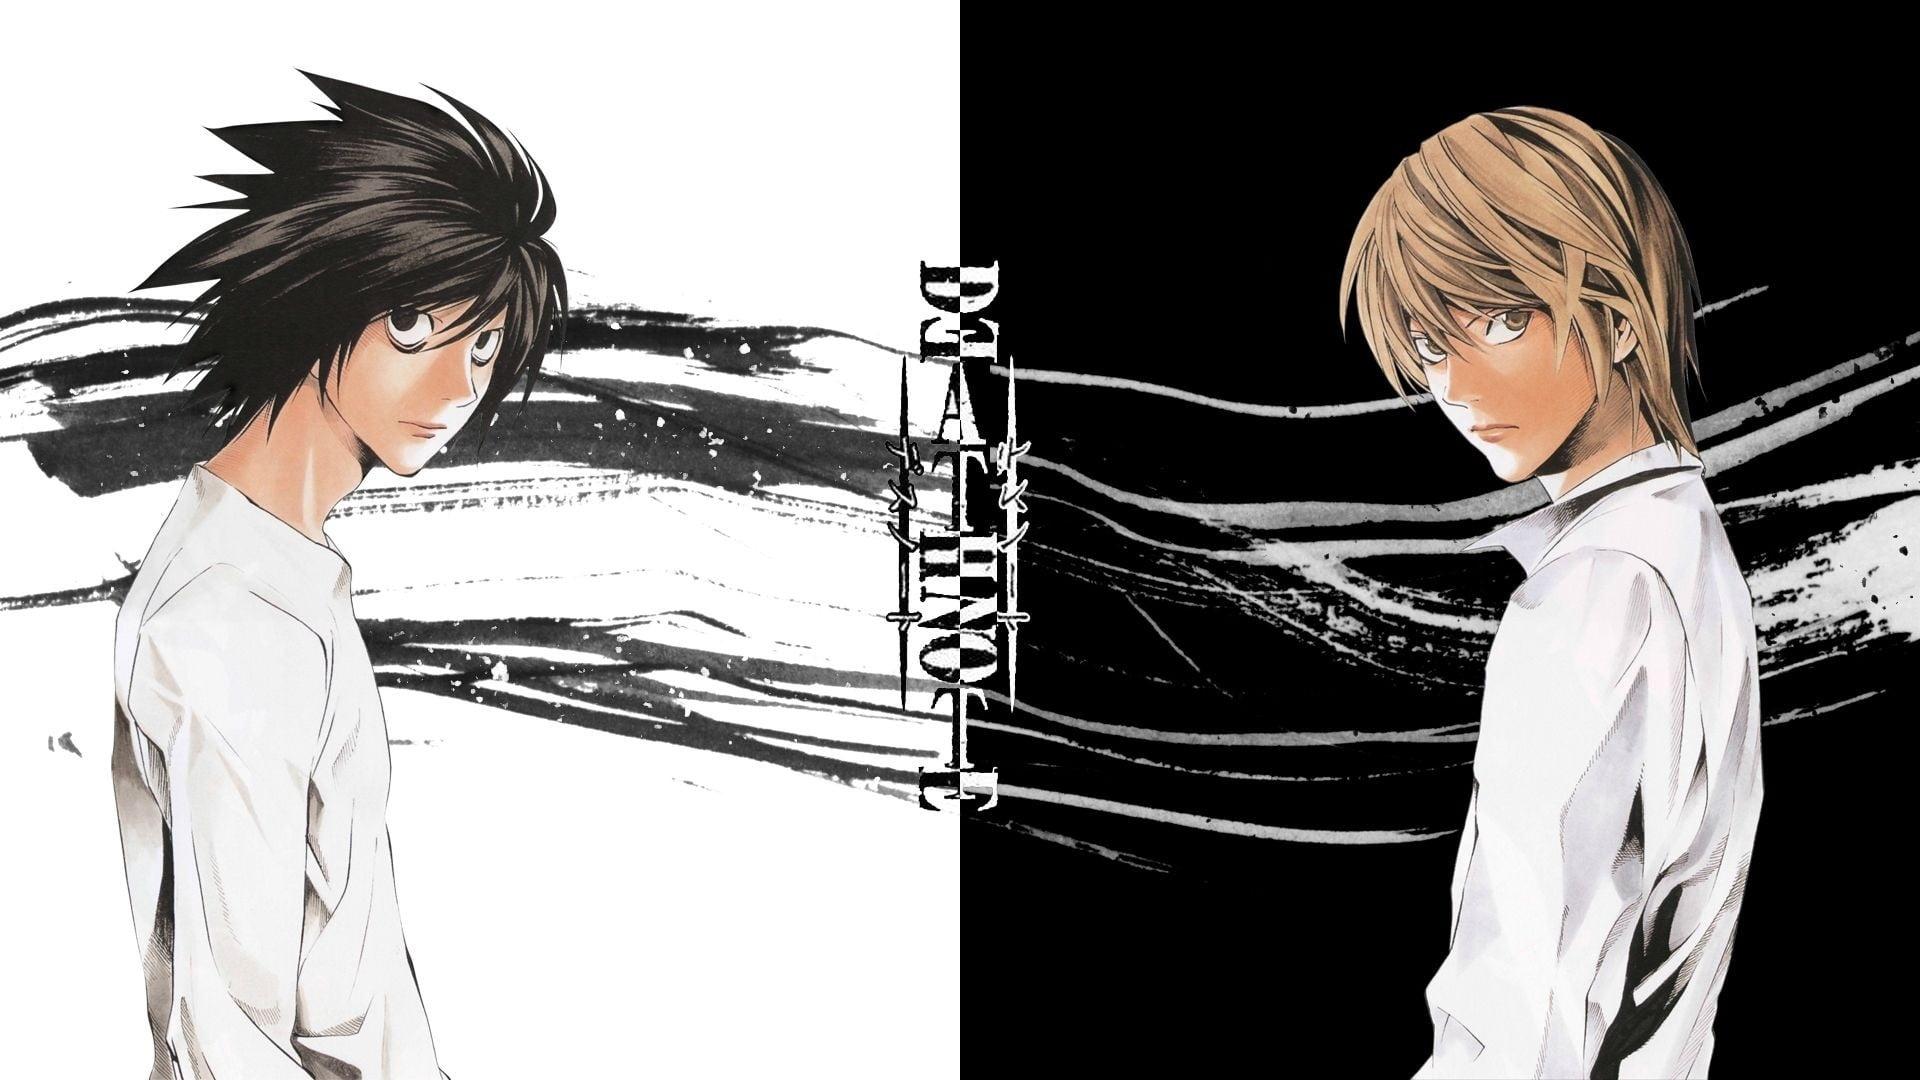 Death Note 1080p wallpaper